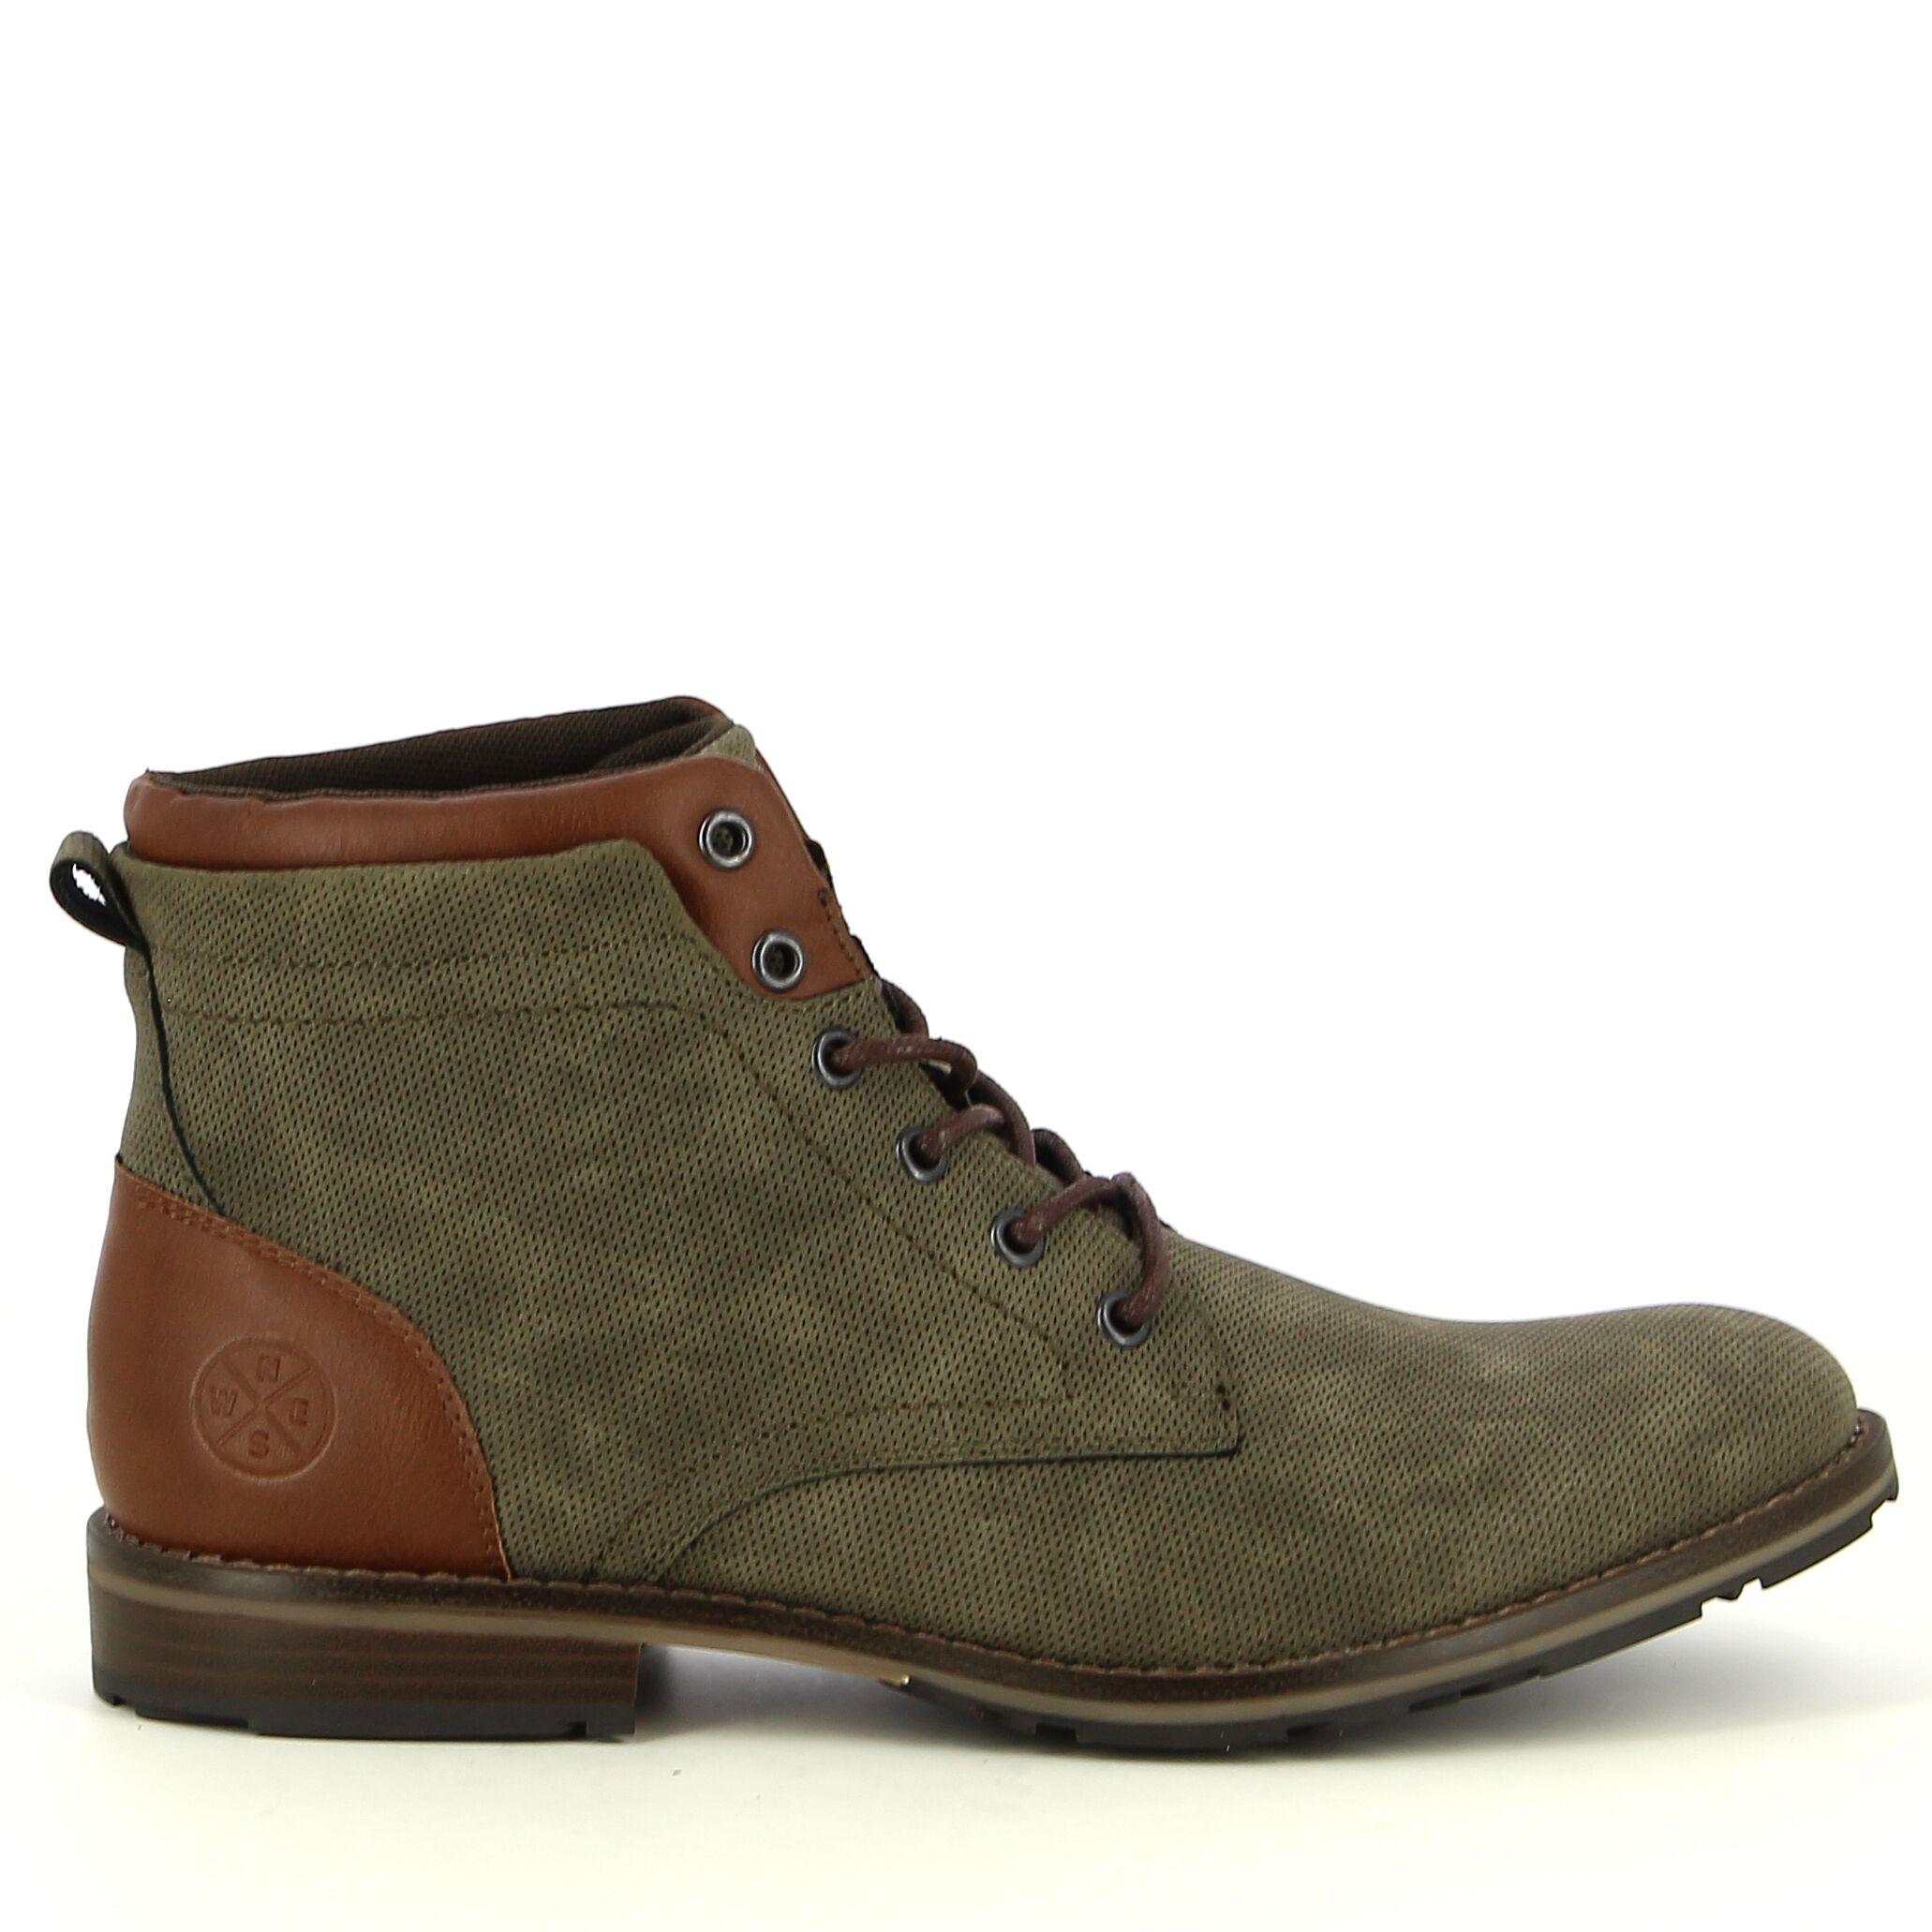 Ken Shoe Fashion - Kaki -Veterschoenen